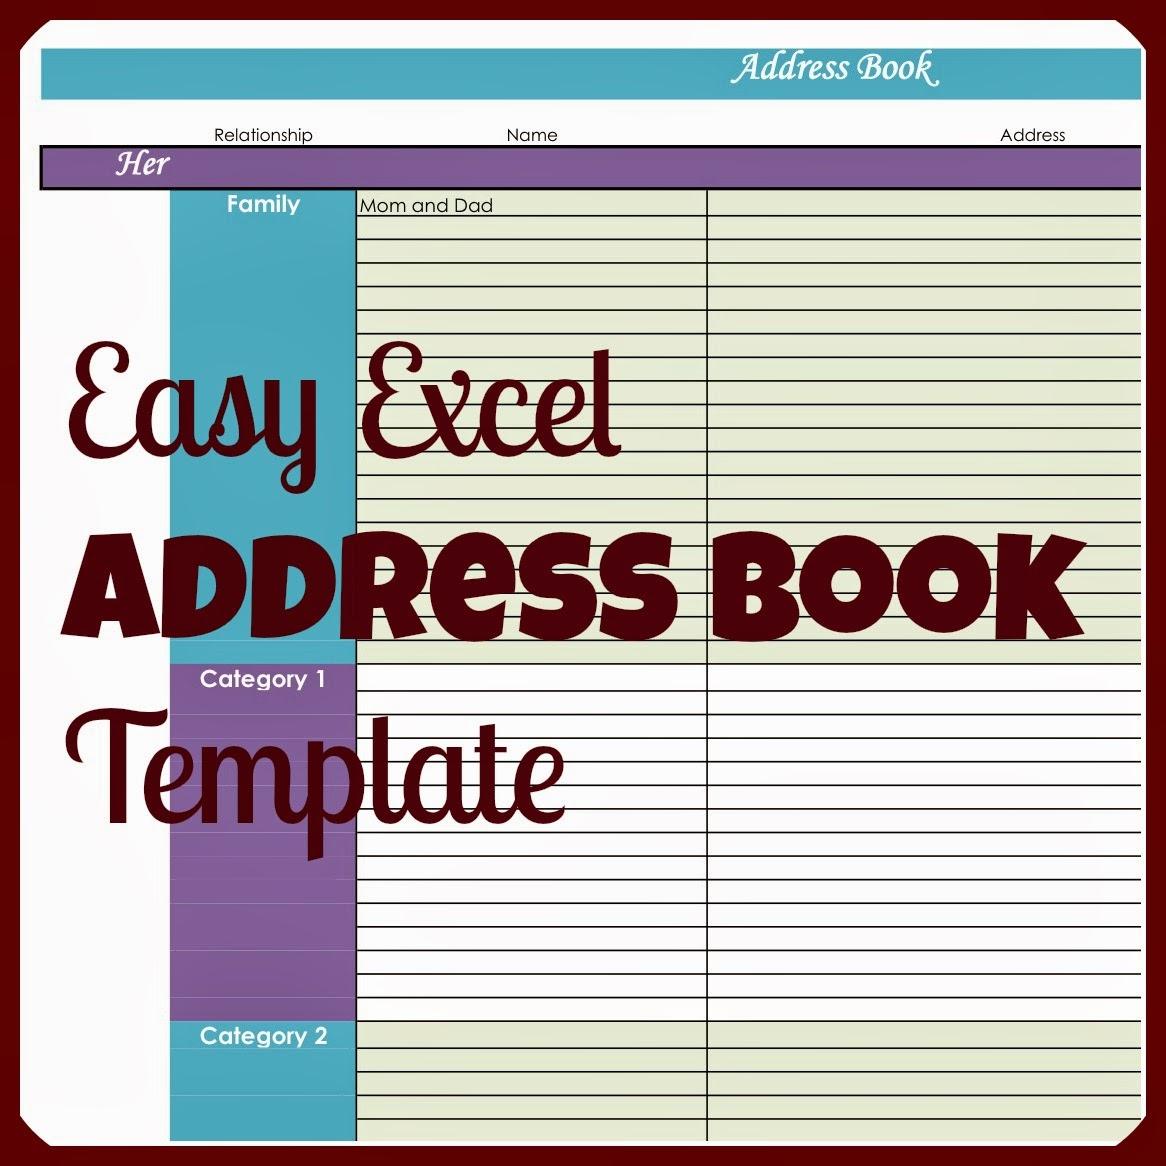 address book template free